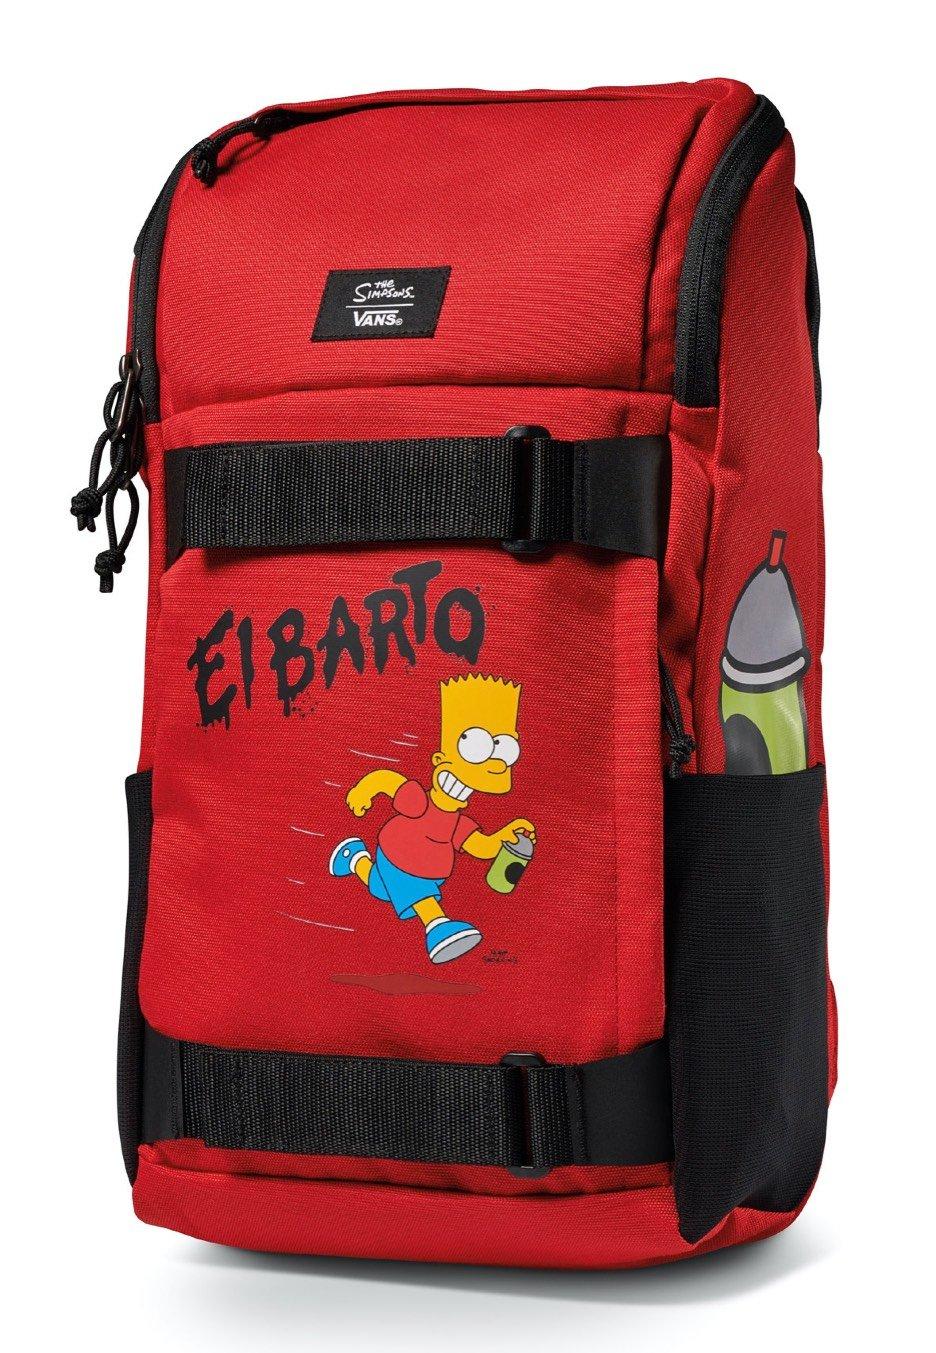 "[ Impericon.com ] VANS x Simpsons / El Barto Rucksack ""Obstacle Skate Pack"" / Rot - Schwarz / 16l - 20l"